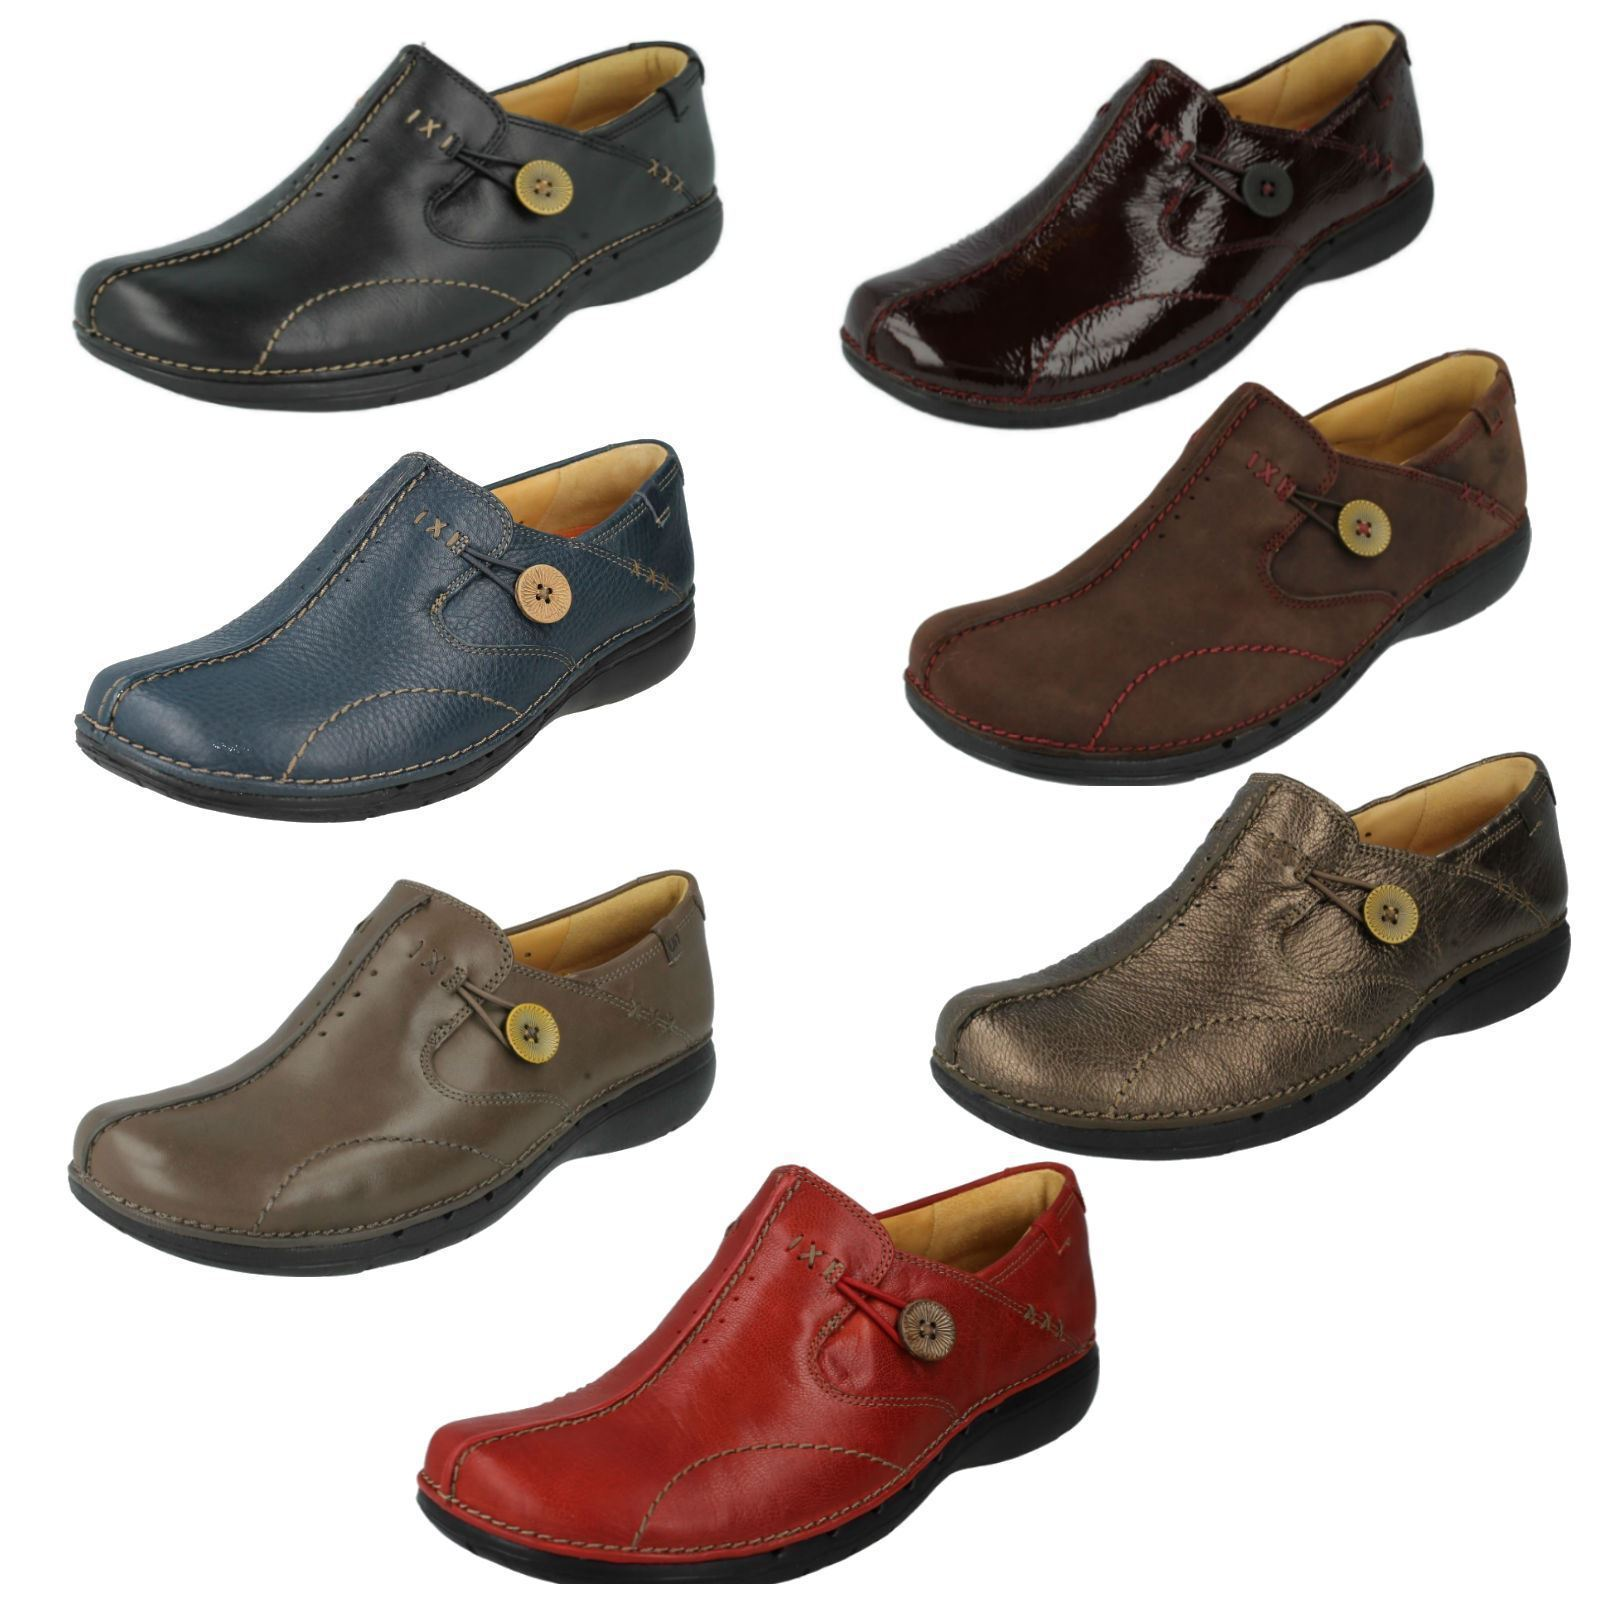 Ladies Clarks scarpe Slip - on  Skin a loop 4  negozio a basso costo